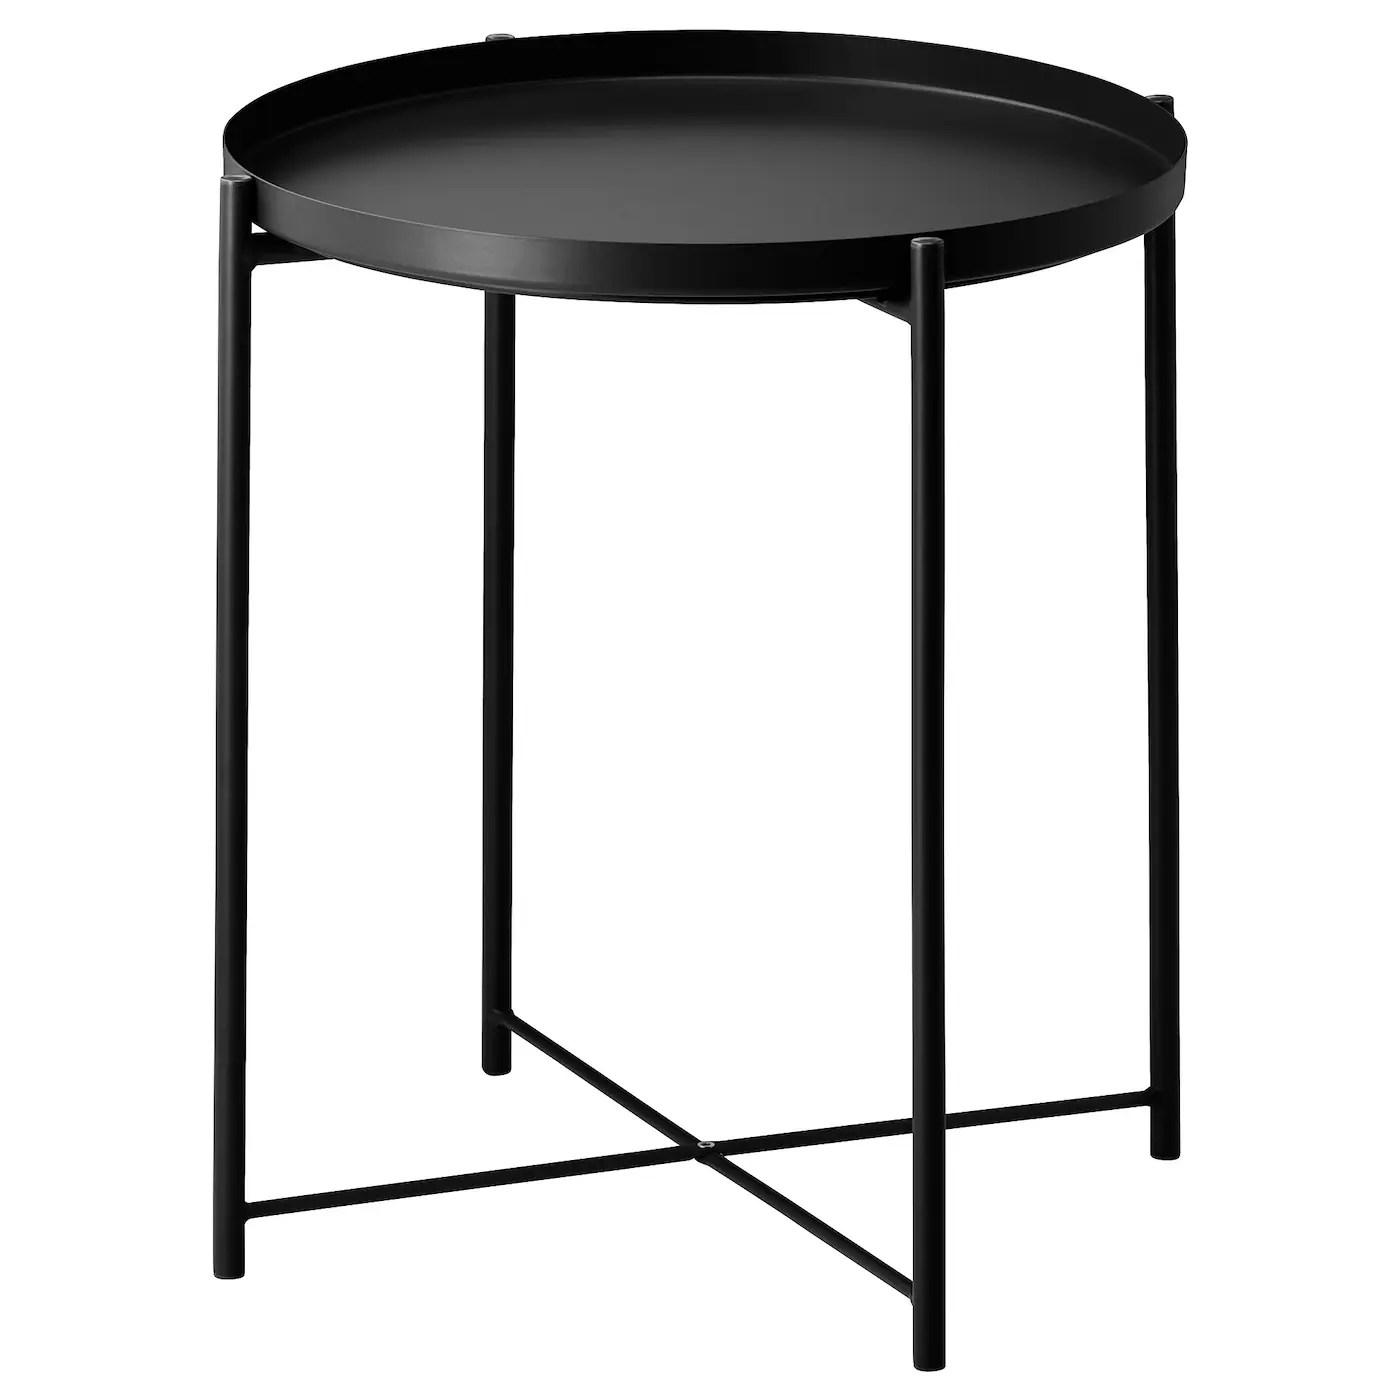 Gladom Tray Table Black 17 1 2x20 5 8 Ikea